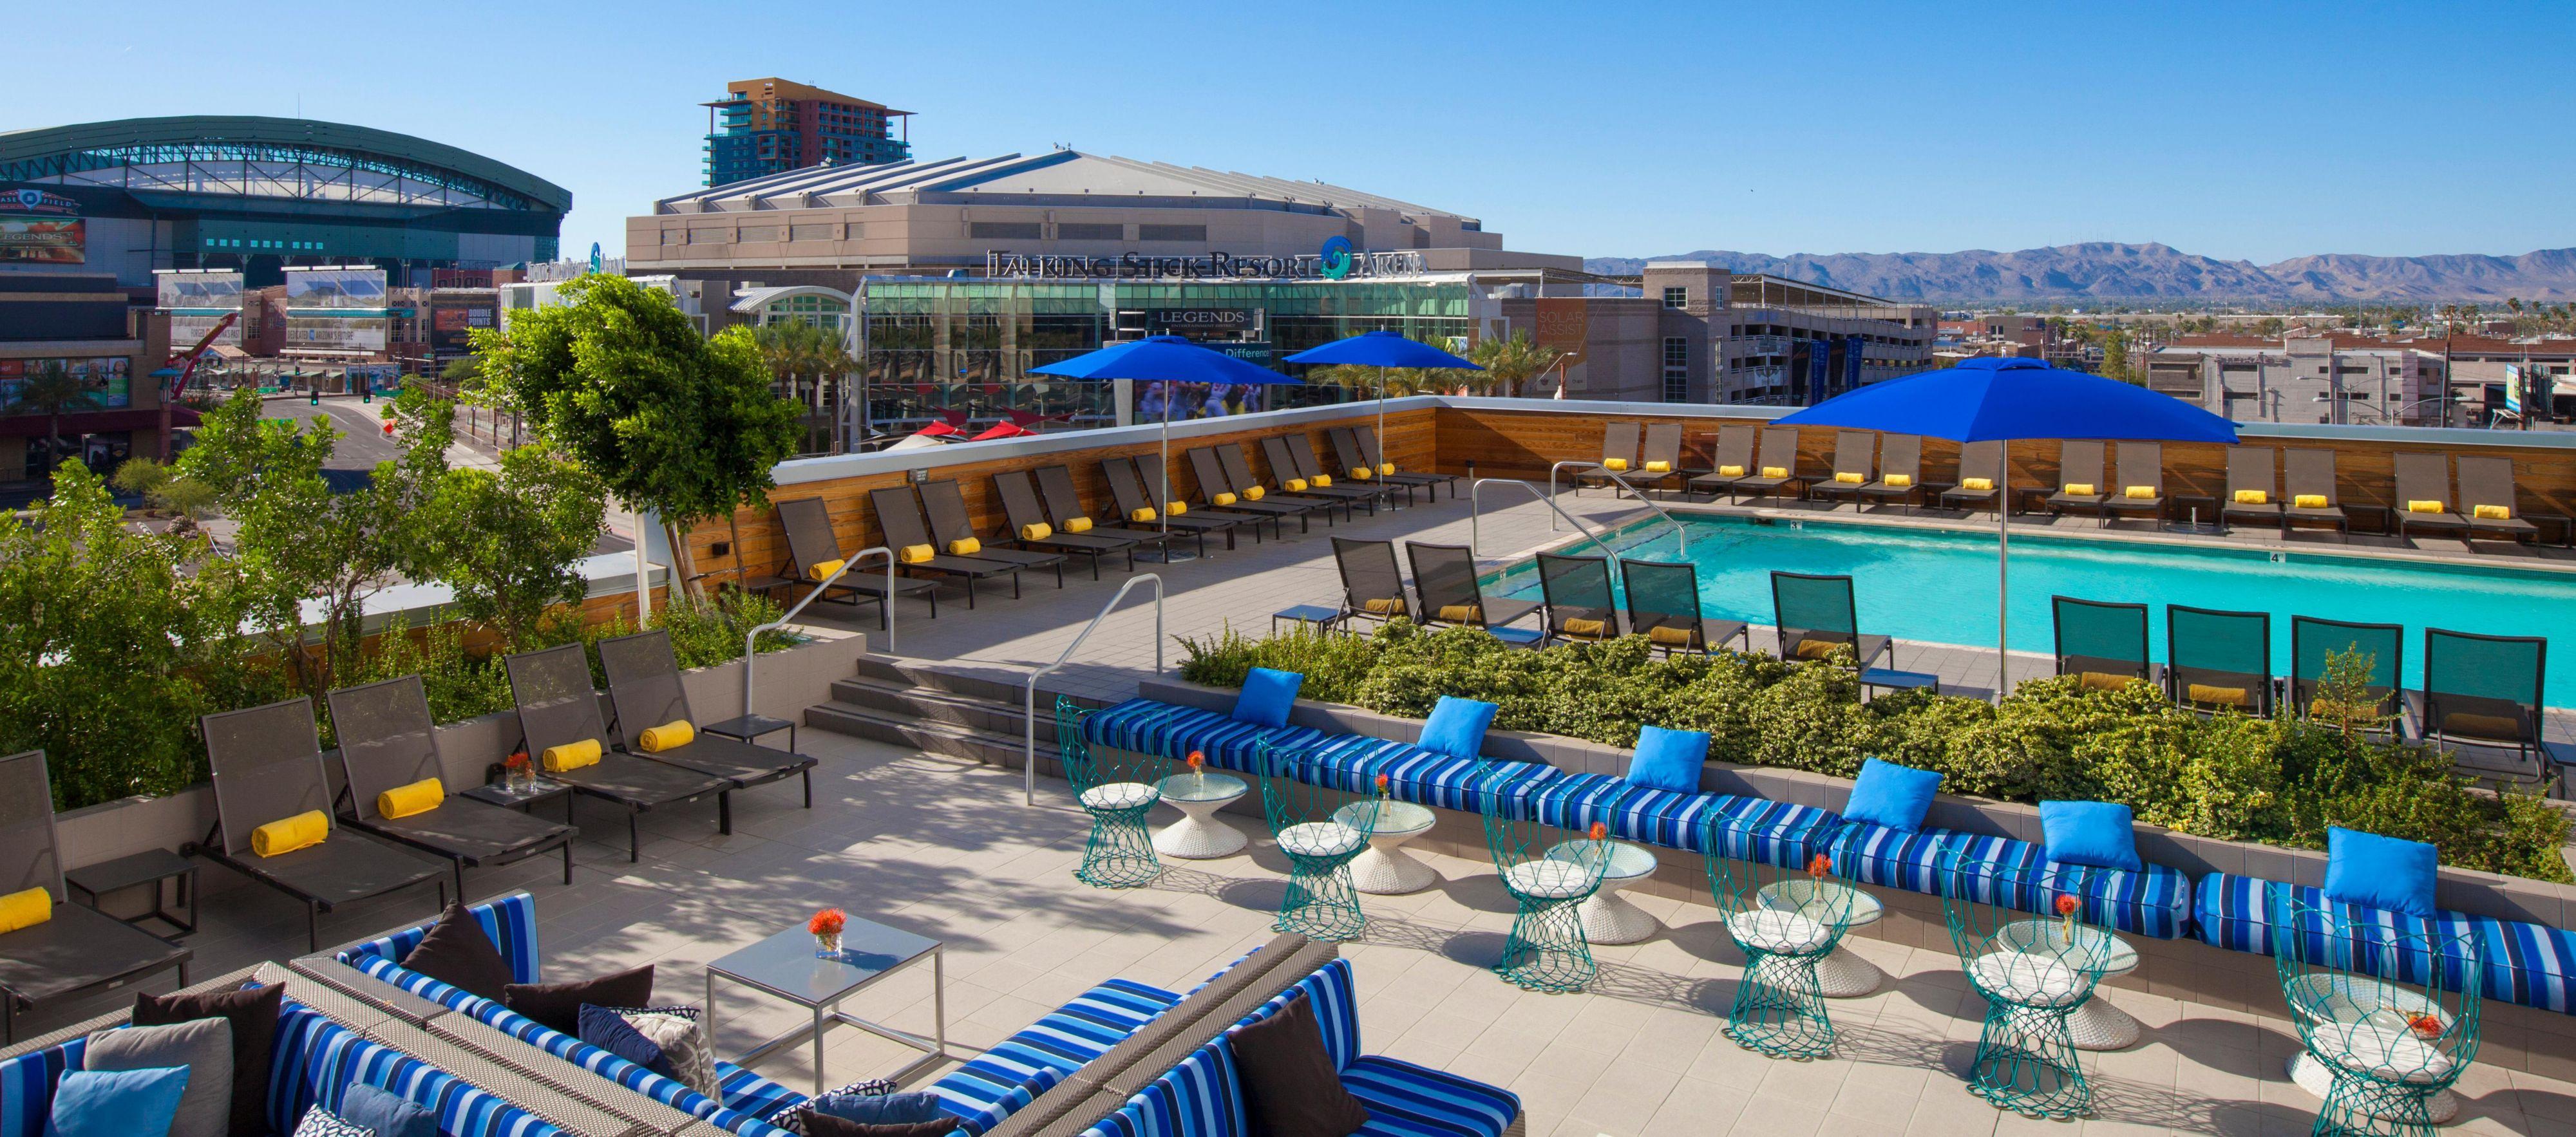 Kimpton Hotel Palomar Phoenix | Downtown Phoenix Hotels | Kimpton Hotels